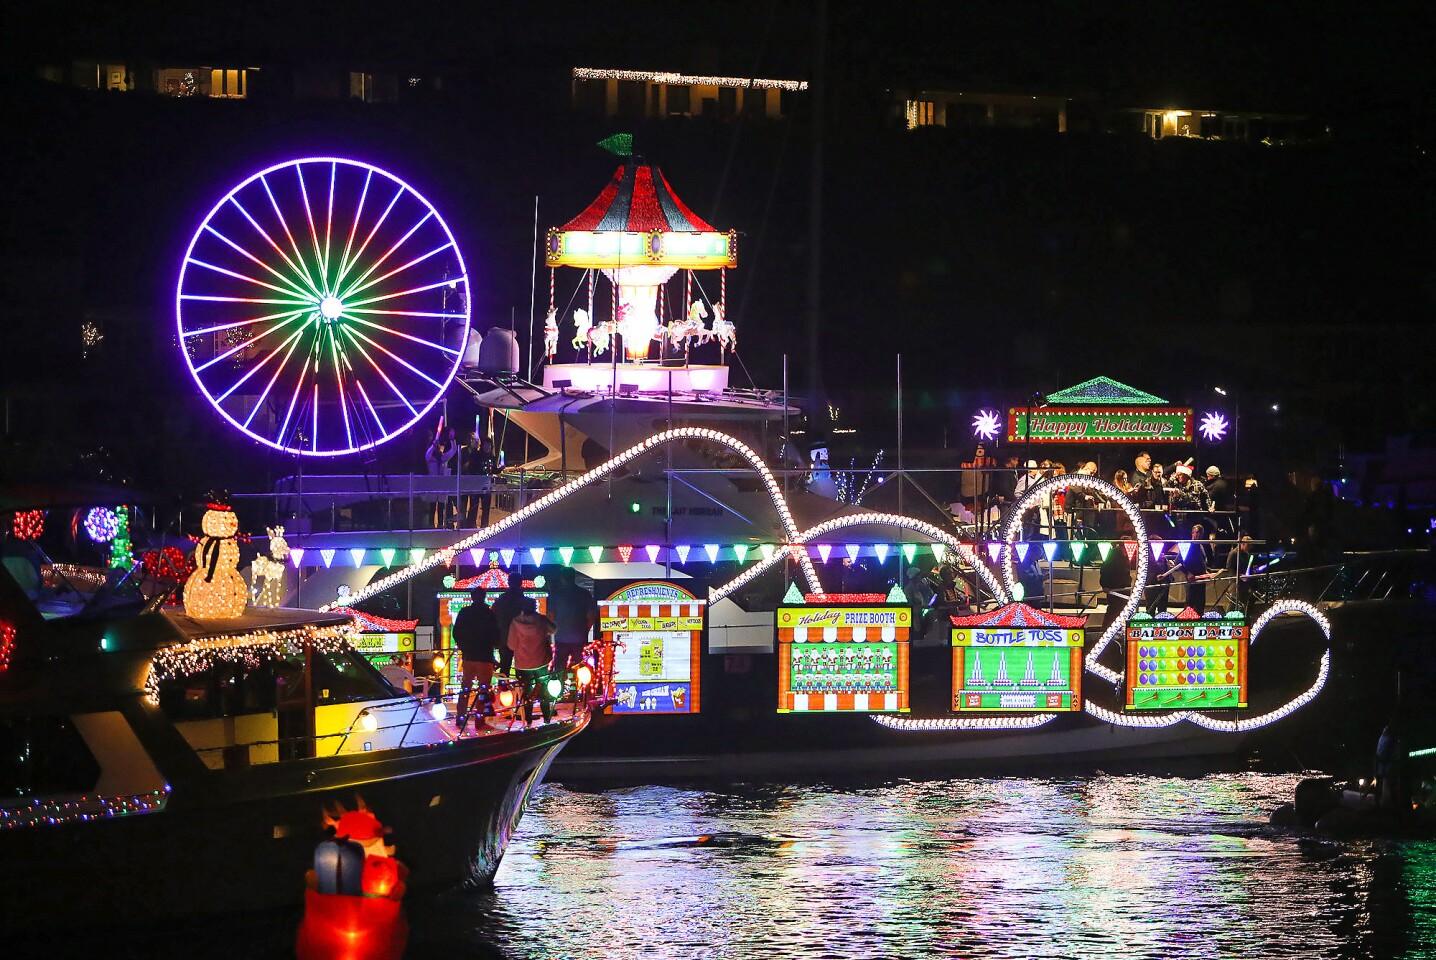 The 110th Newport Beach Christmas Boat Parade